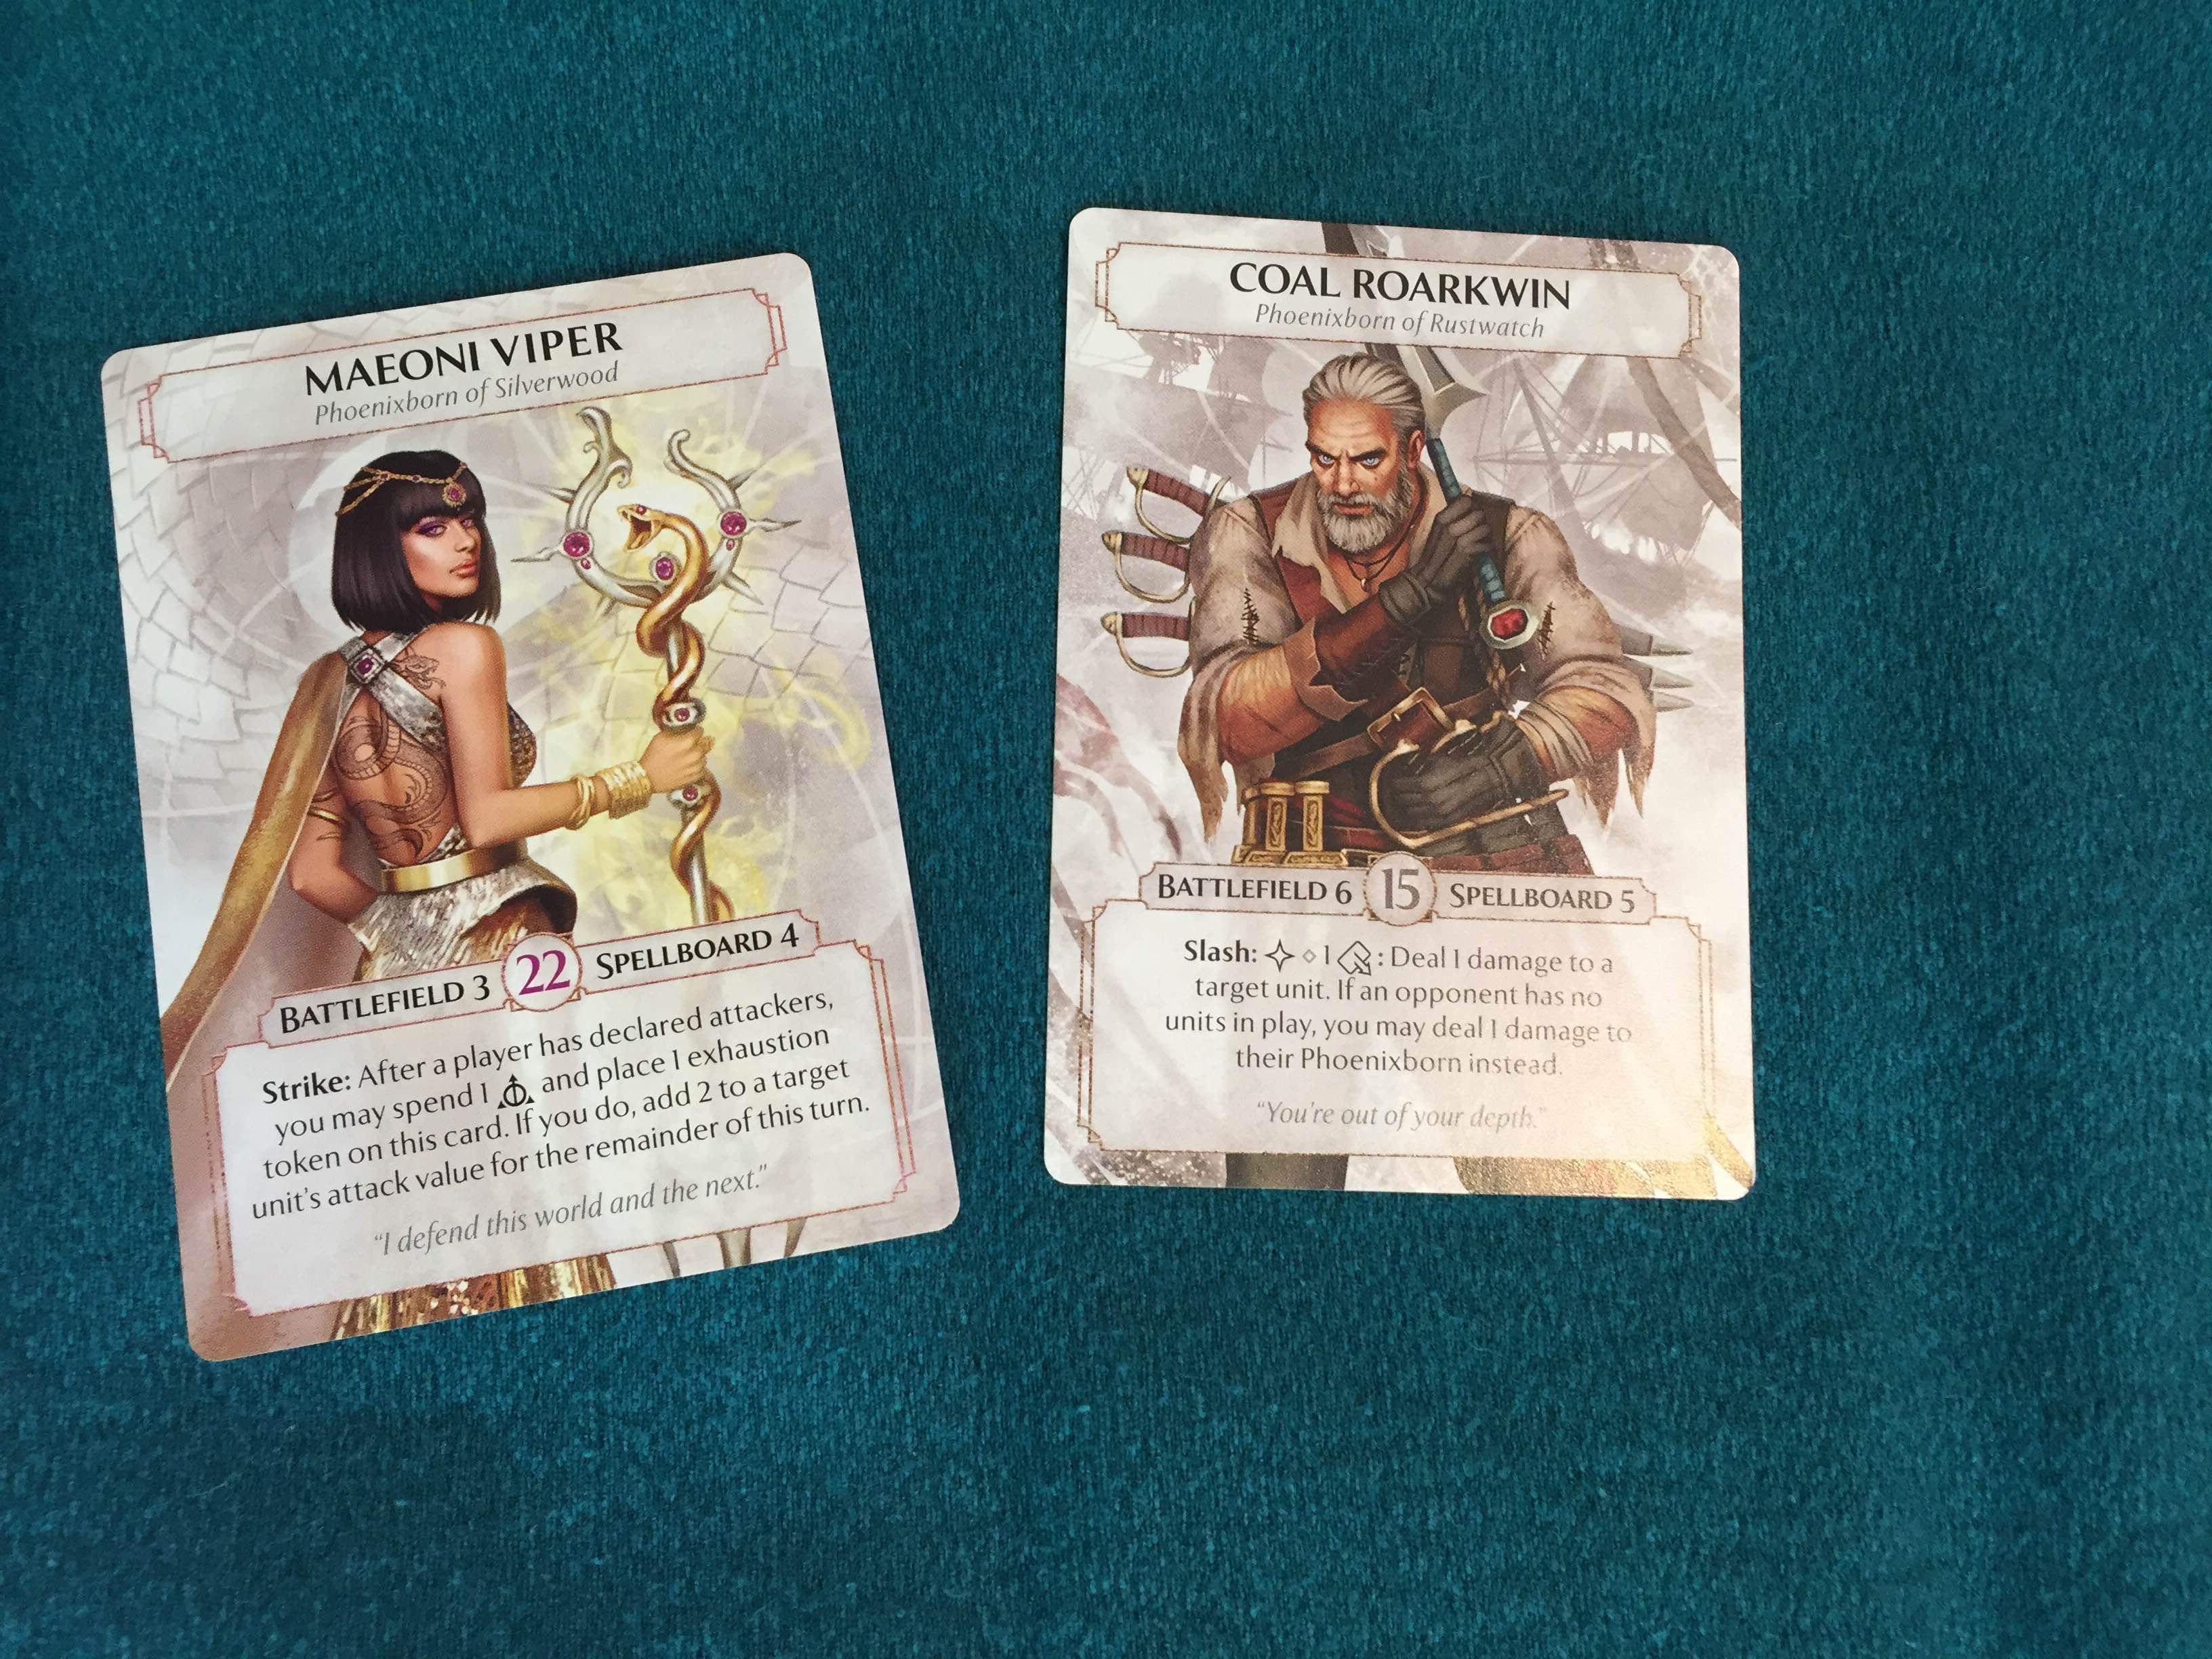 Maeoni Viper and Coal Roarkwin, the Phoenixborn characters we played with.